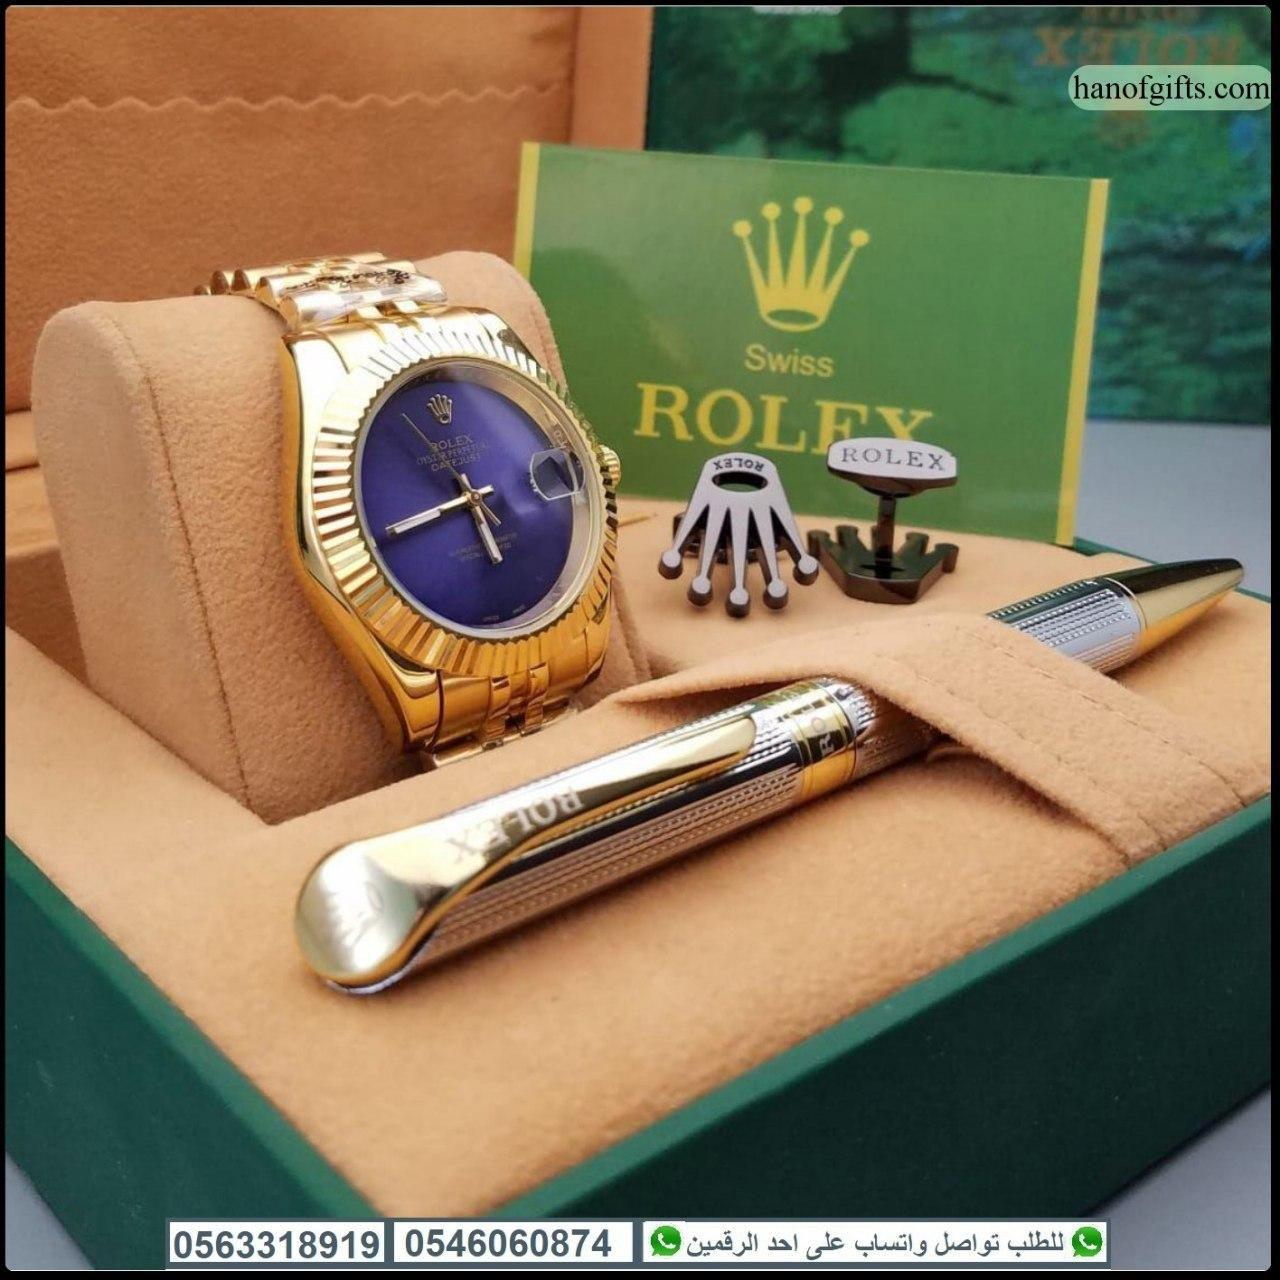 ساعات رولكس رجالي مع قلم و كبك رولكس و علبه فخمه هدايا هنوف Michael Kors Watch Gold Watch Kors Watches